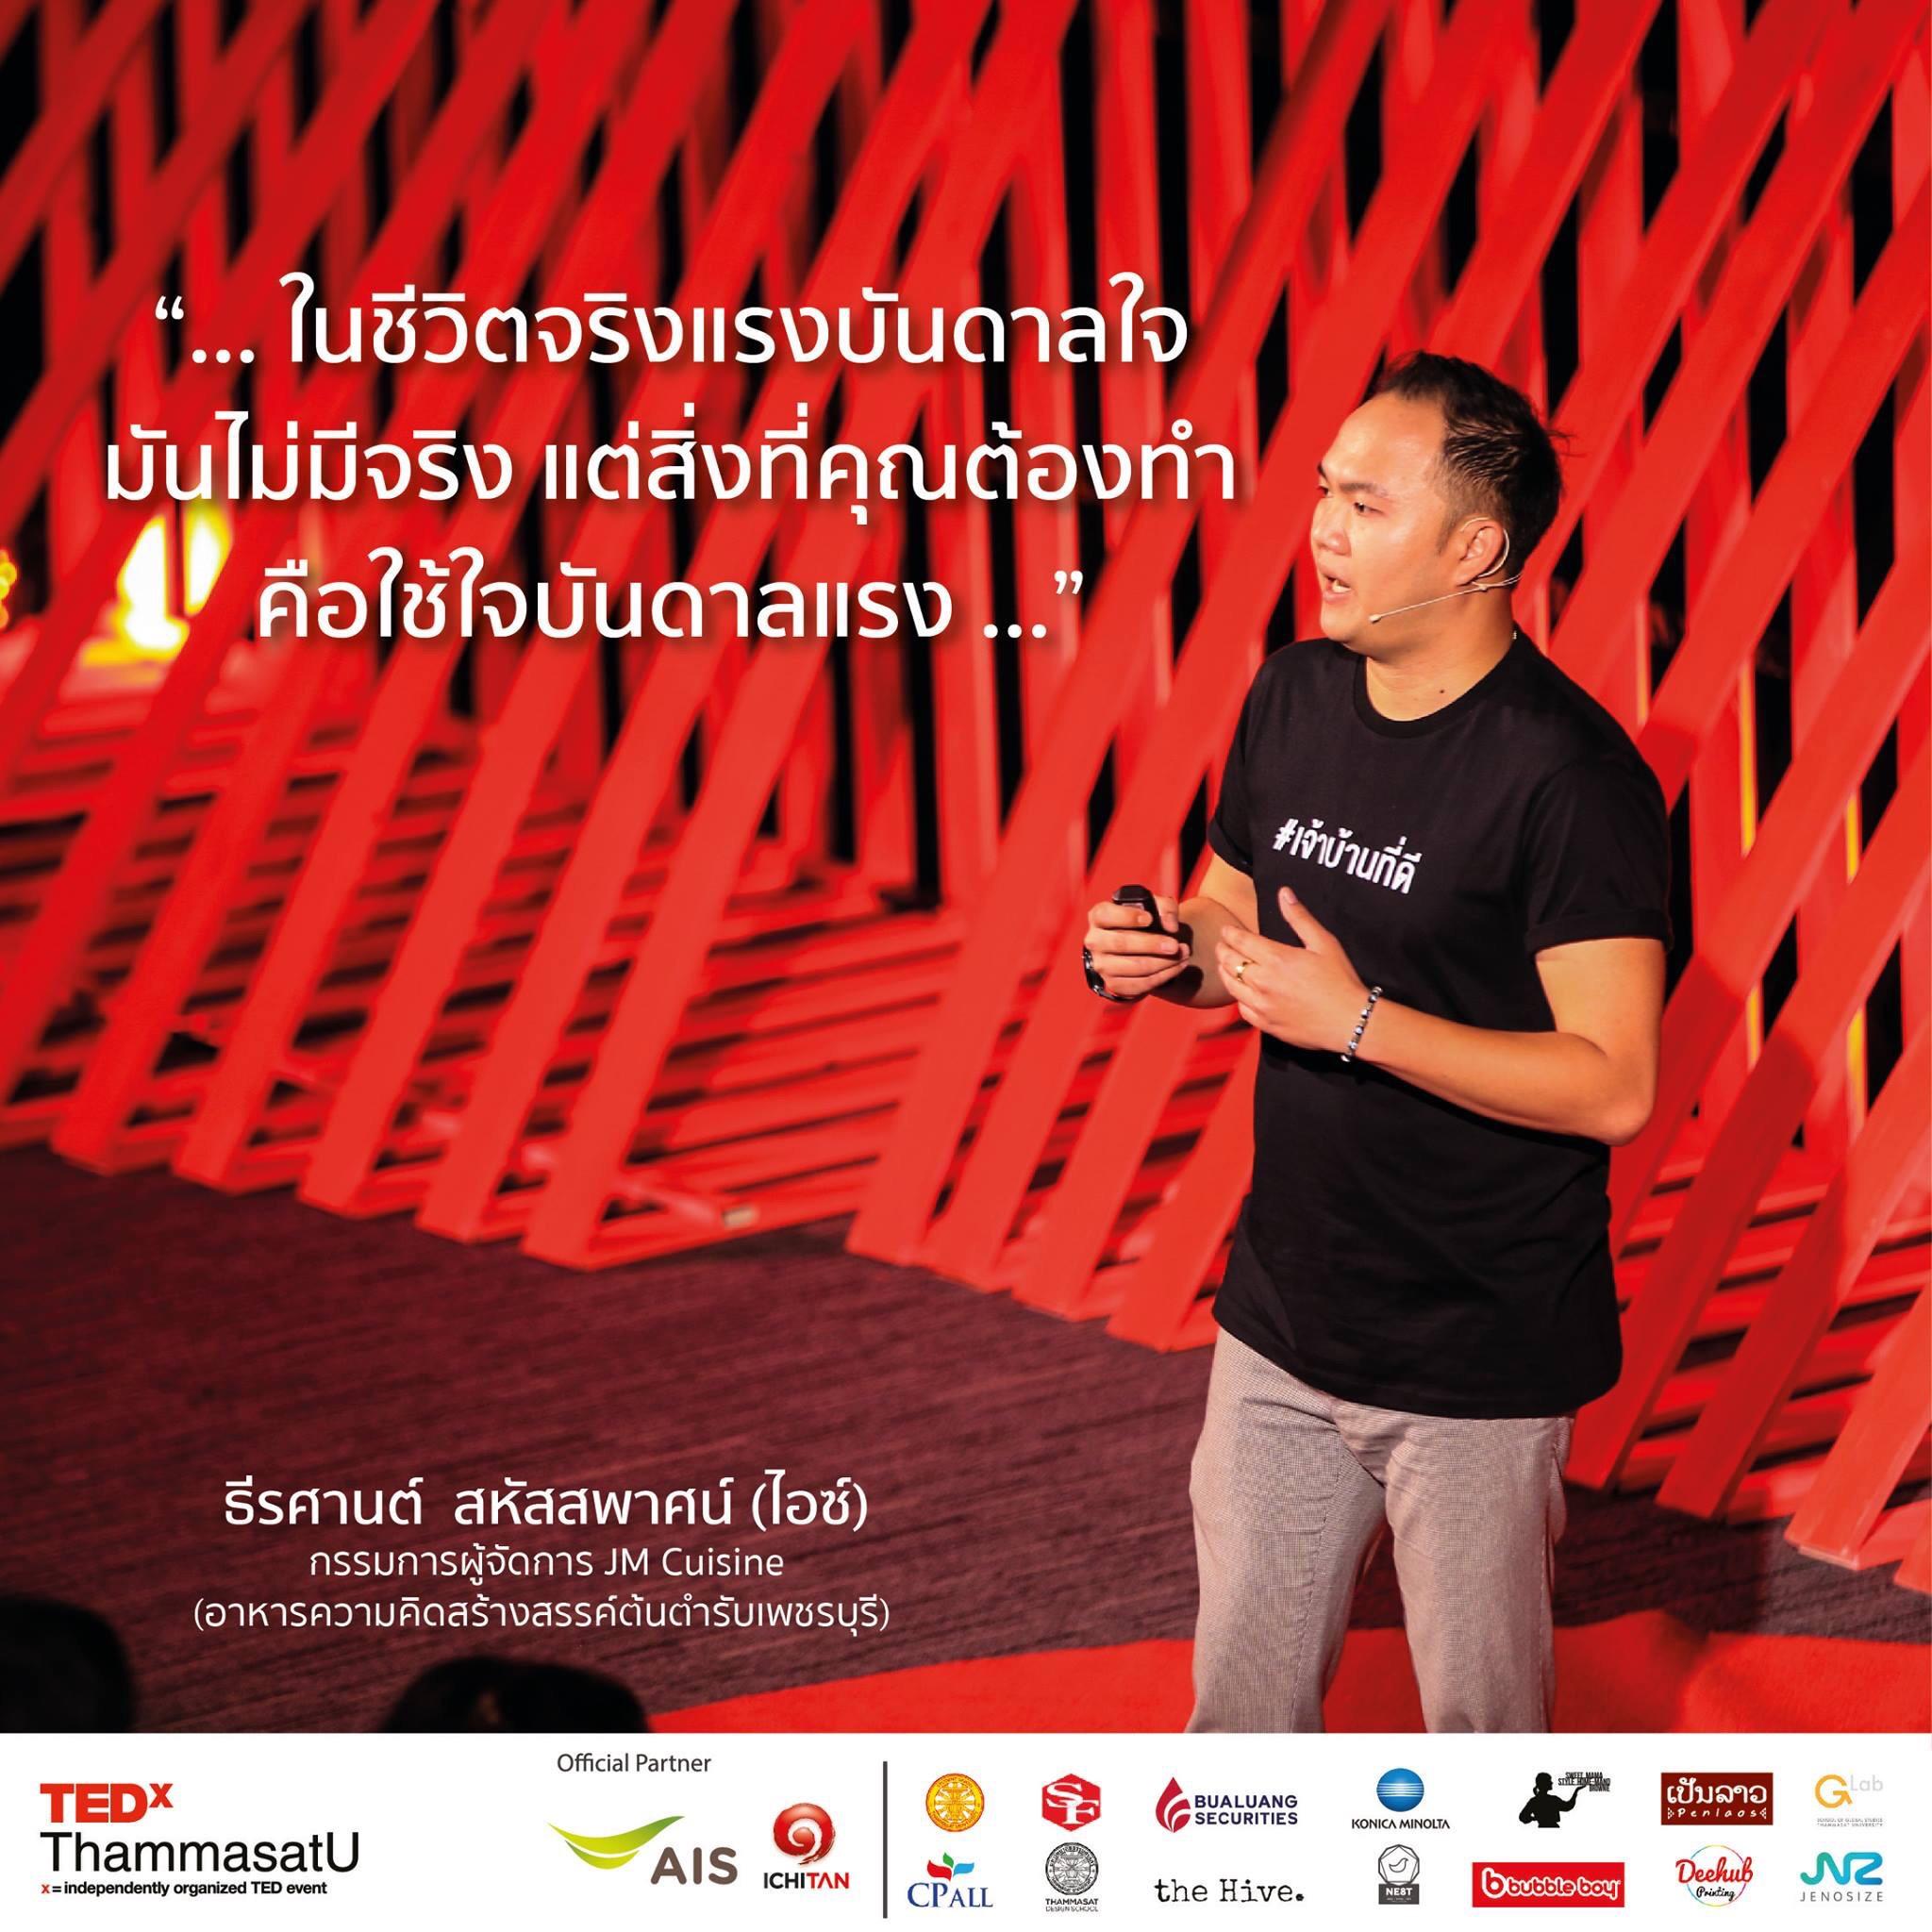 Tirasan Sahatsapas , @iczz ,#TEDxThammasatU , ธีรศานต์ สหัสสพาศน์, ไอซ์ , TEDx ธรรมศาสตร์